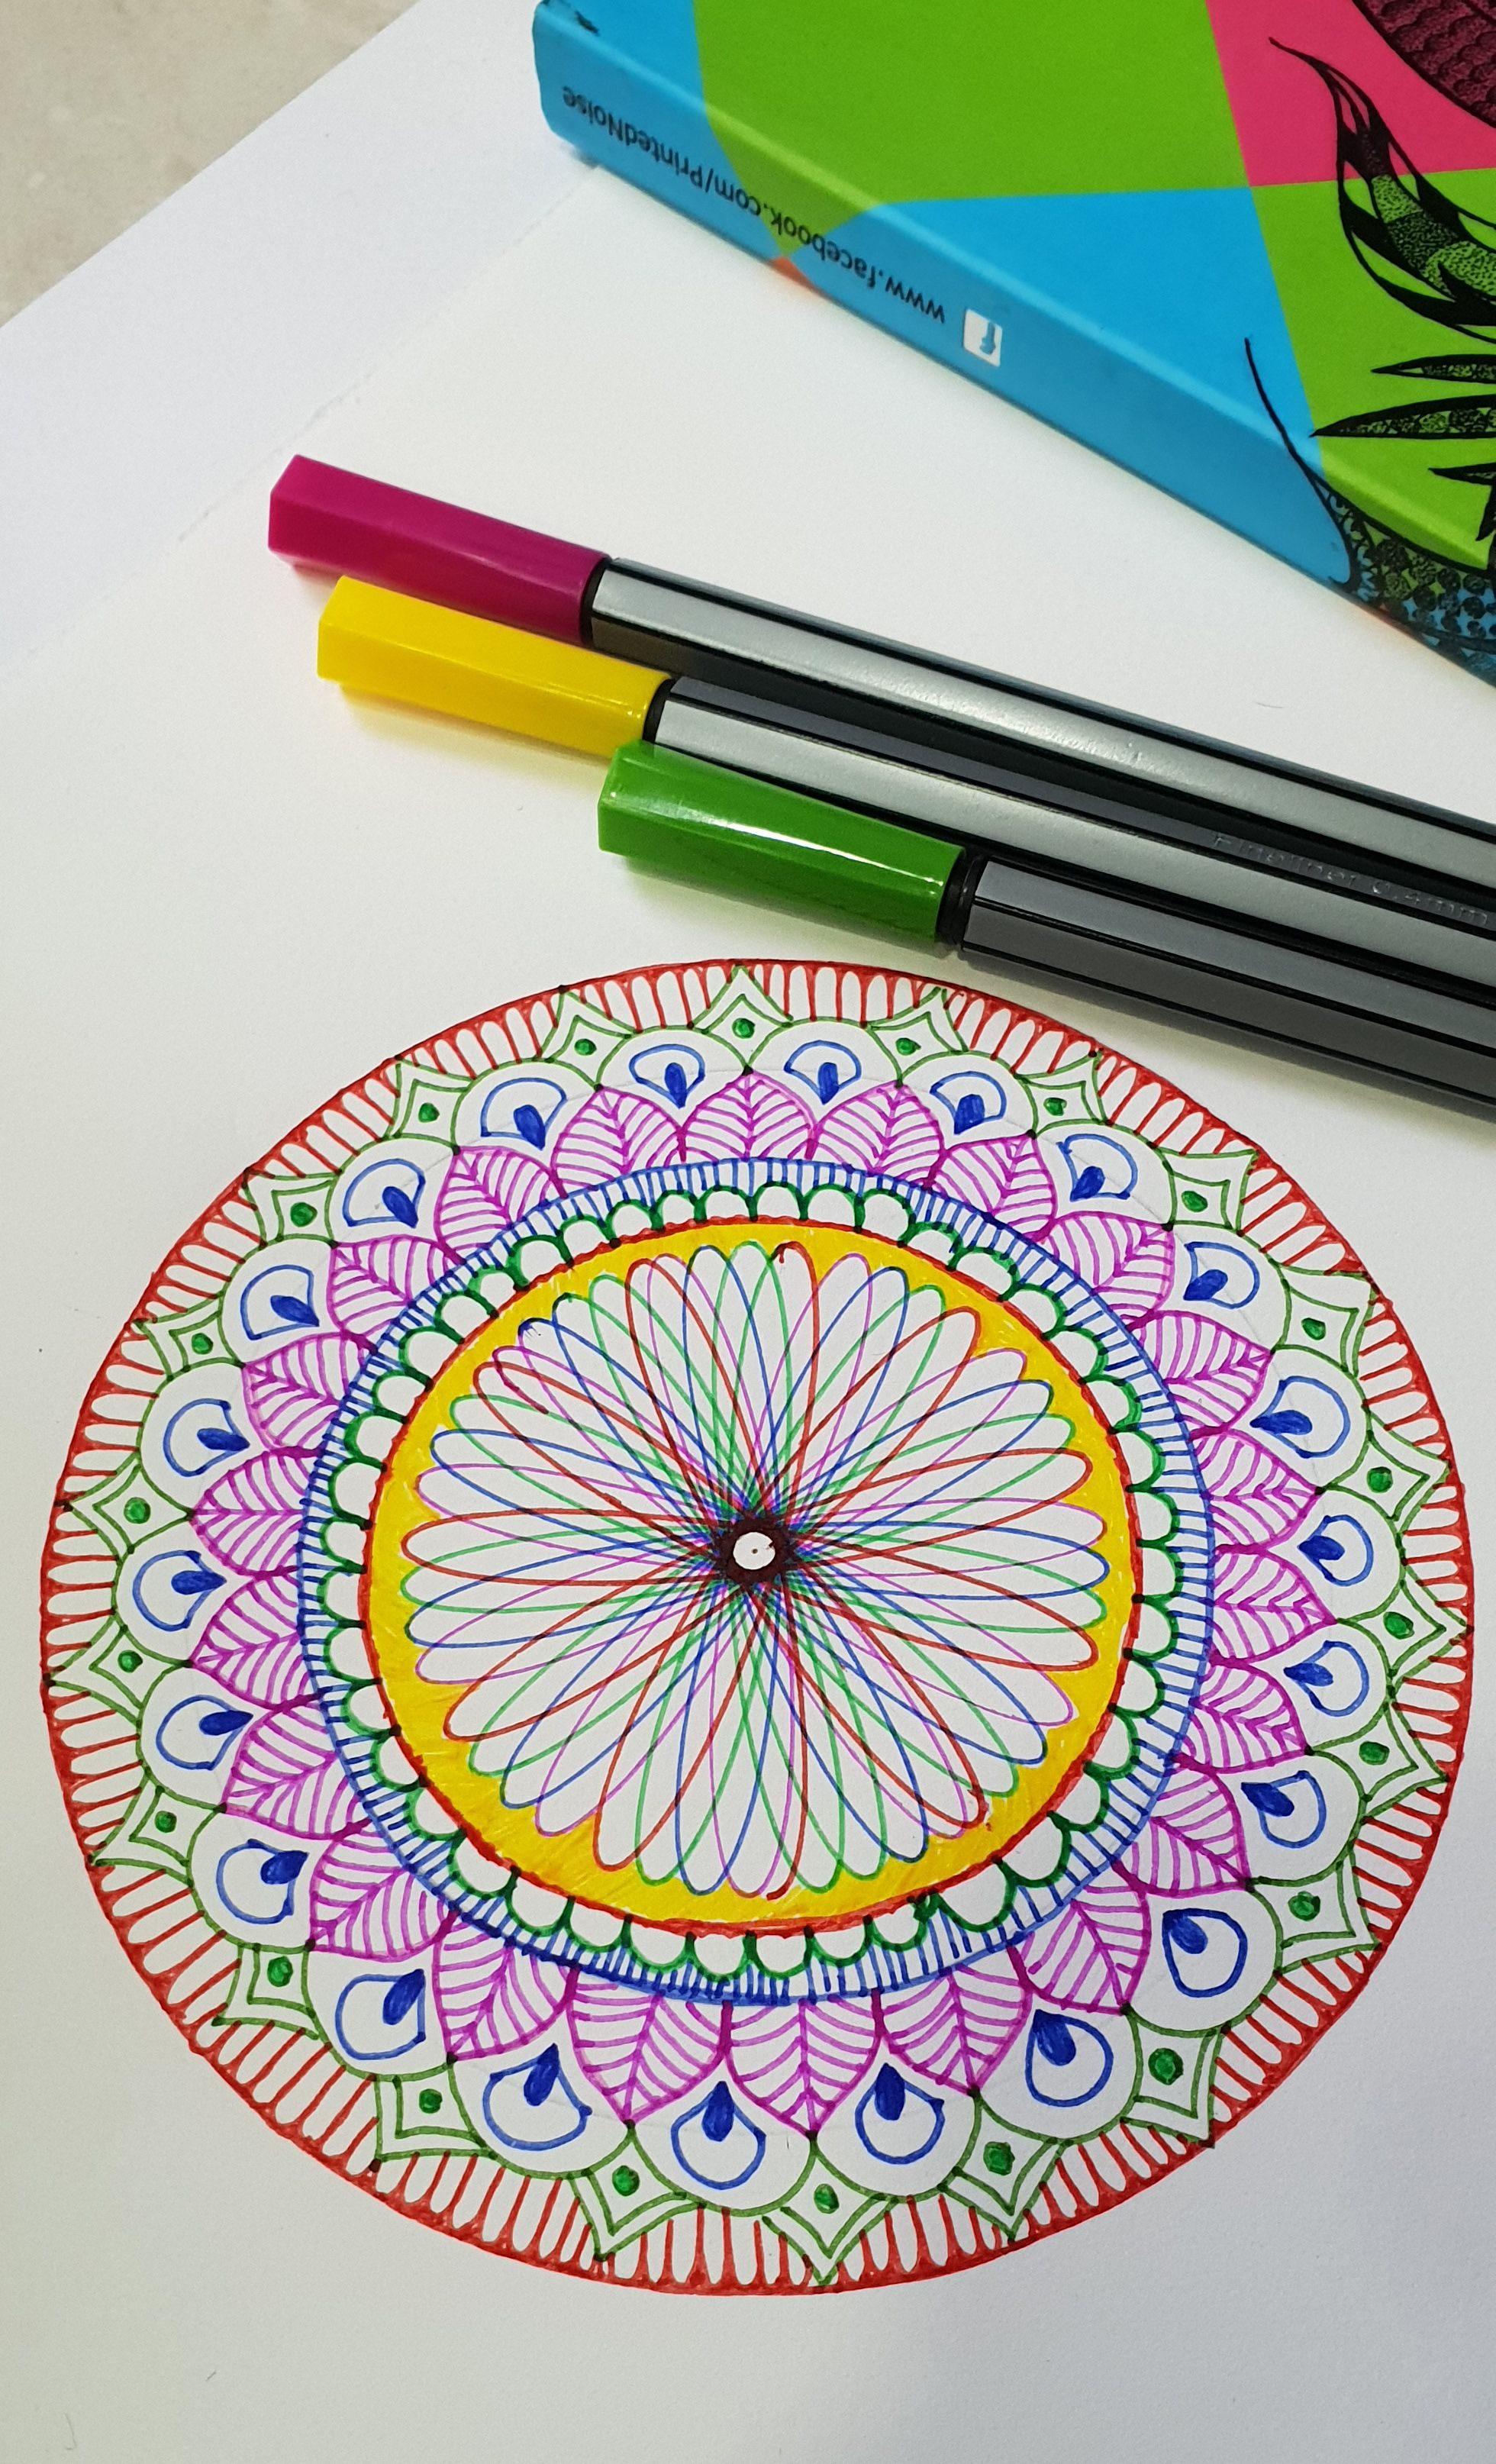 Spirograph And Mandala Design Spirography Mandalaart